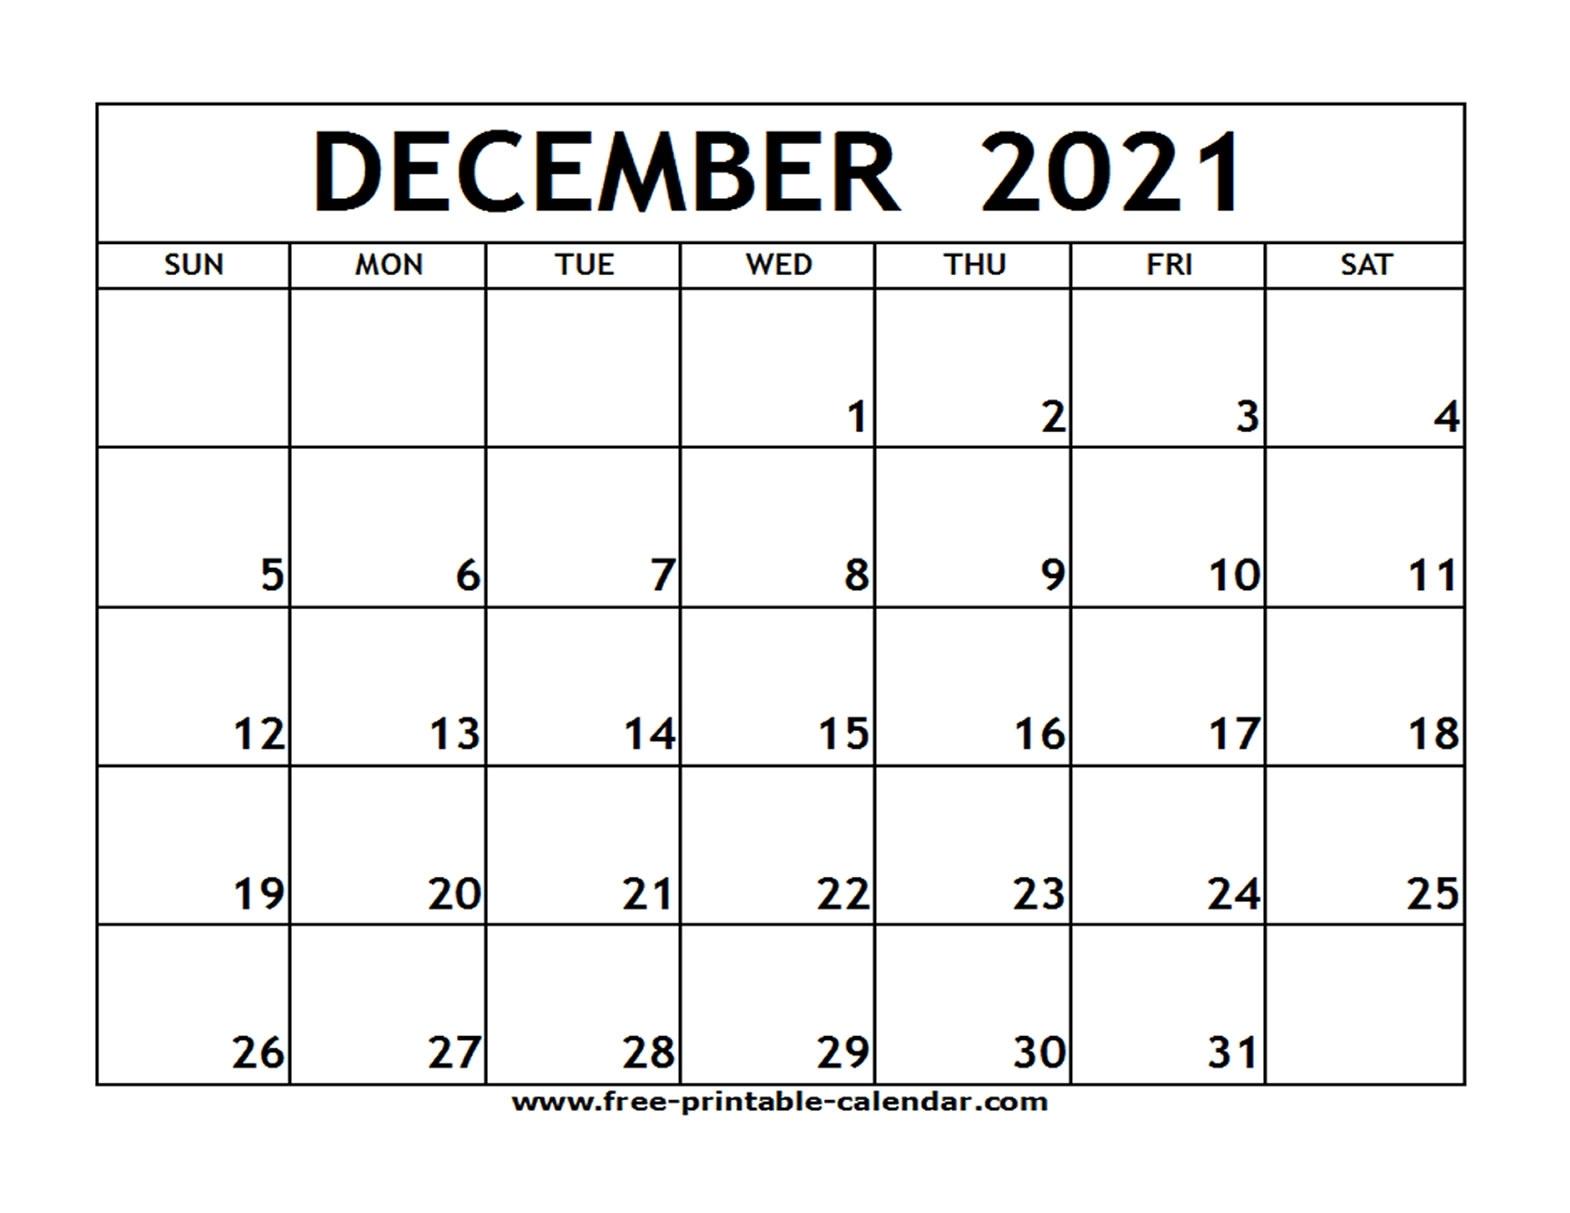 Take 2021 Free Printable Weekly Calendar Template